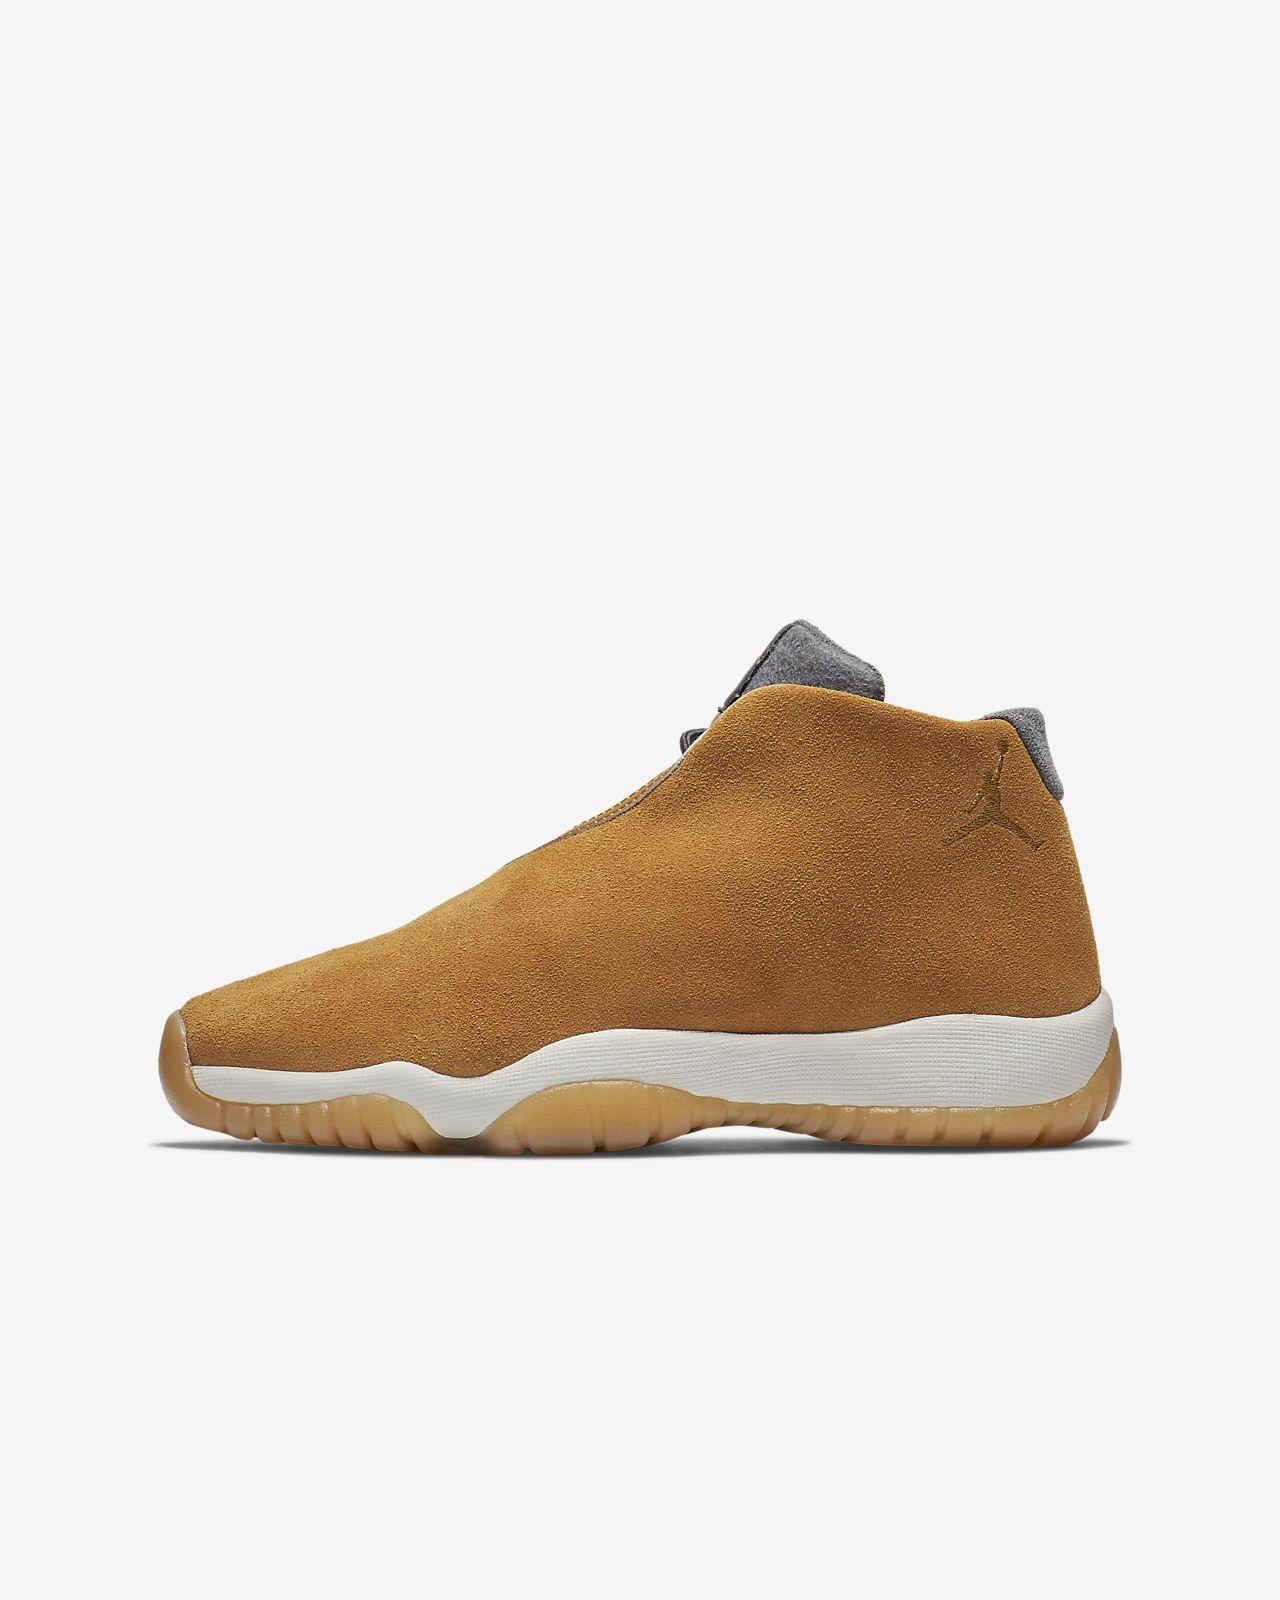 Calzado para niños talla grande Air Jordan Future